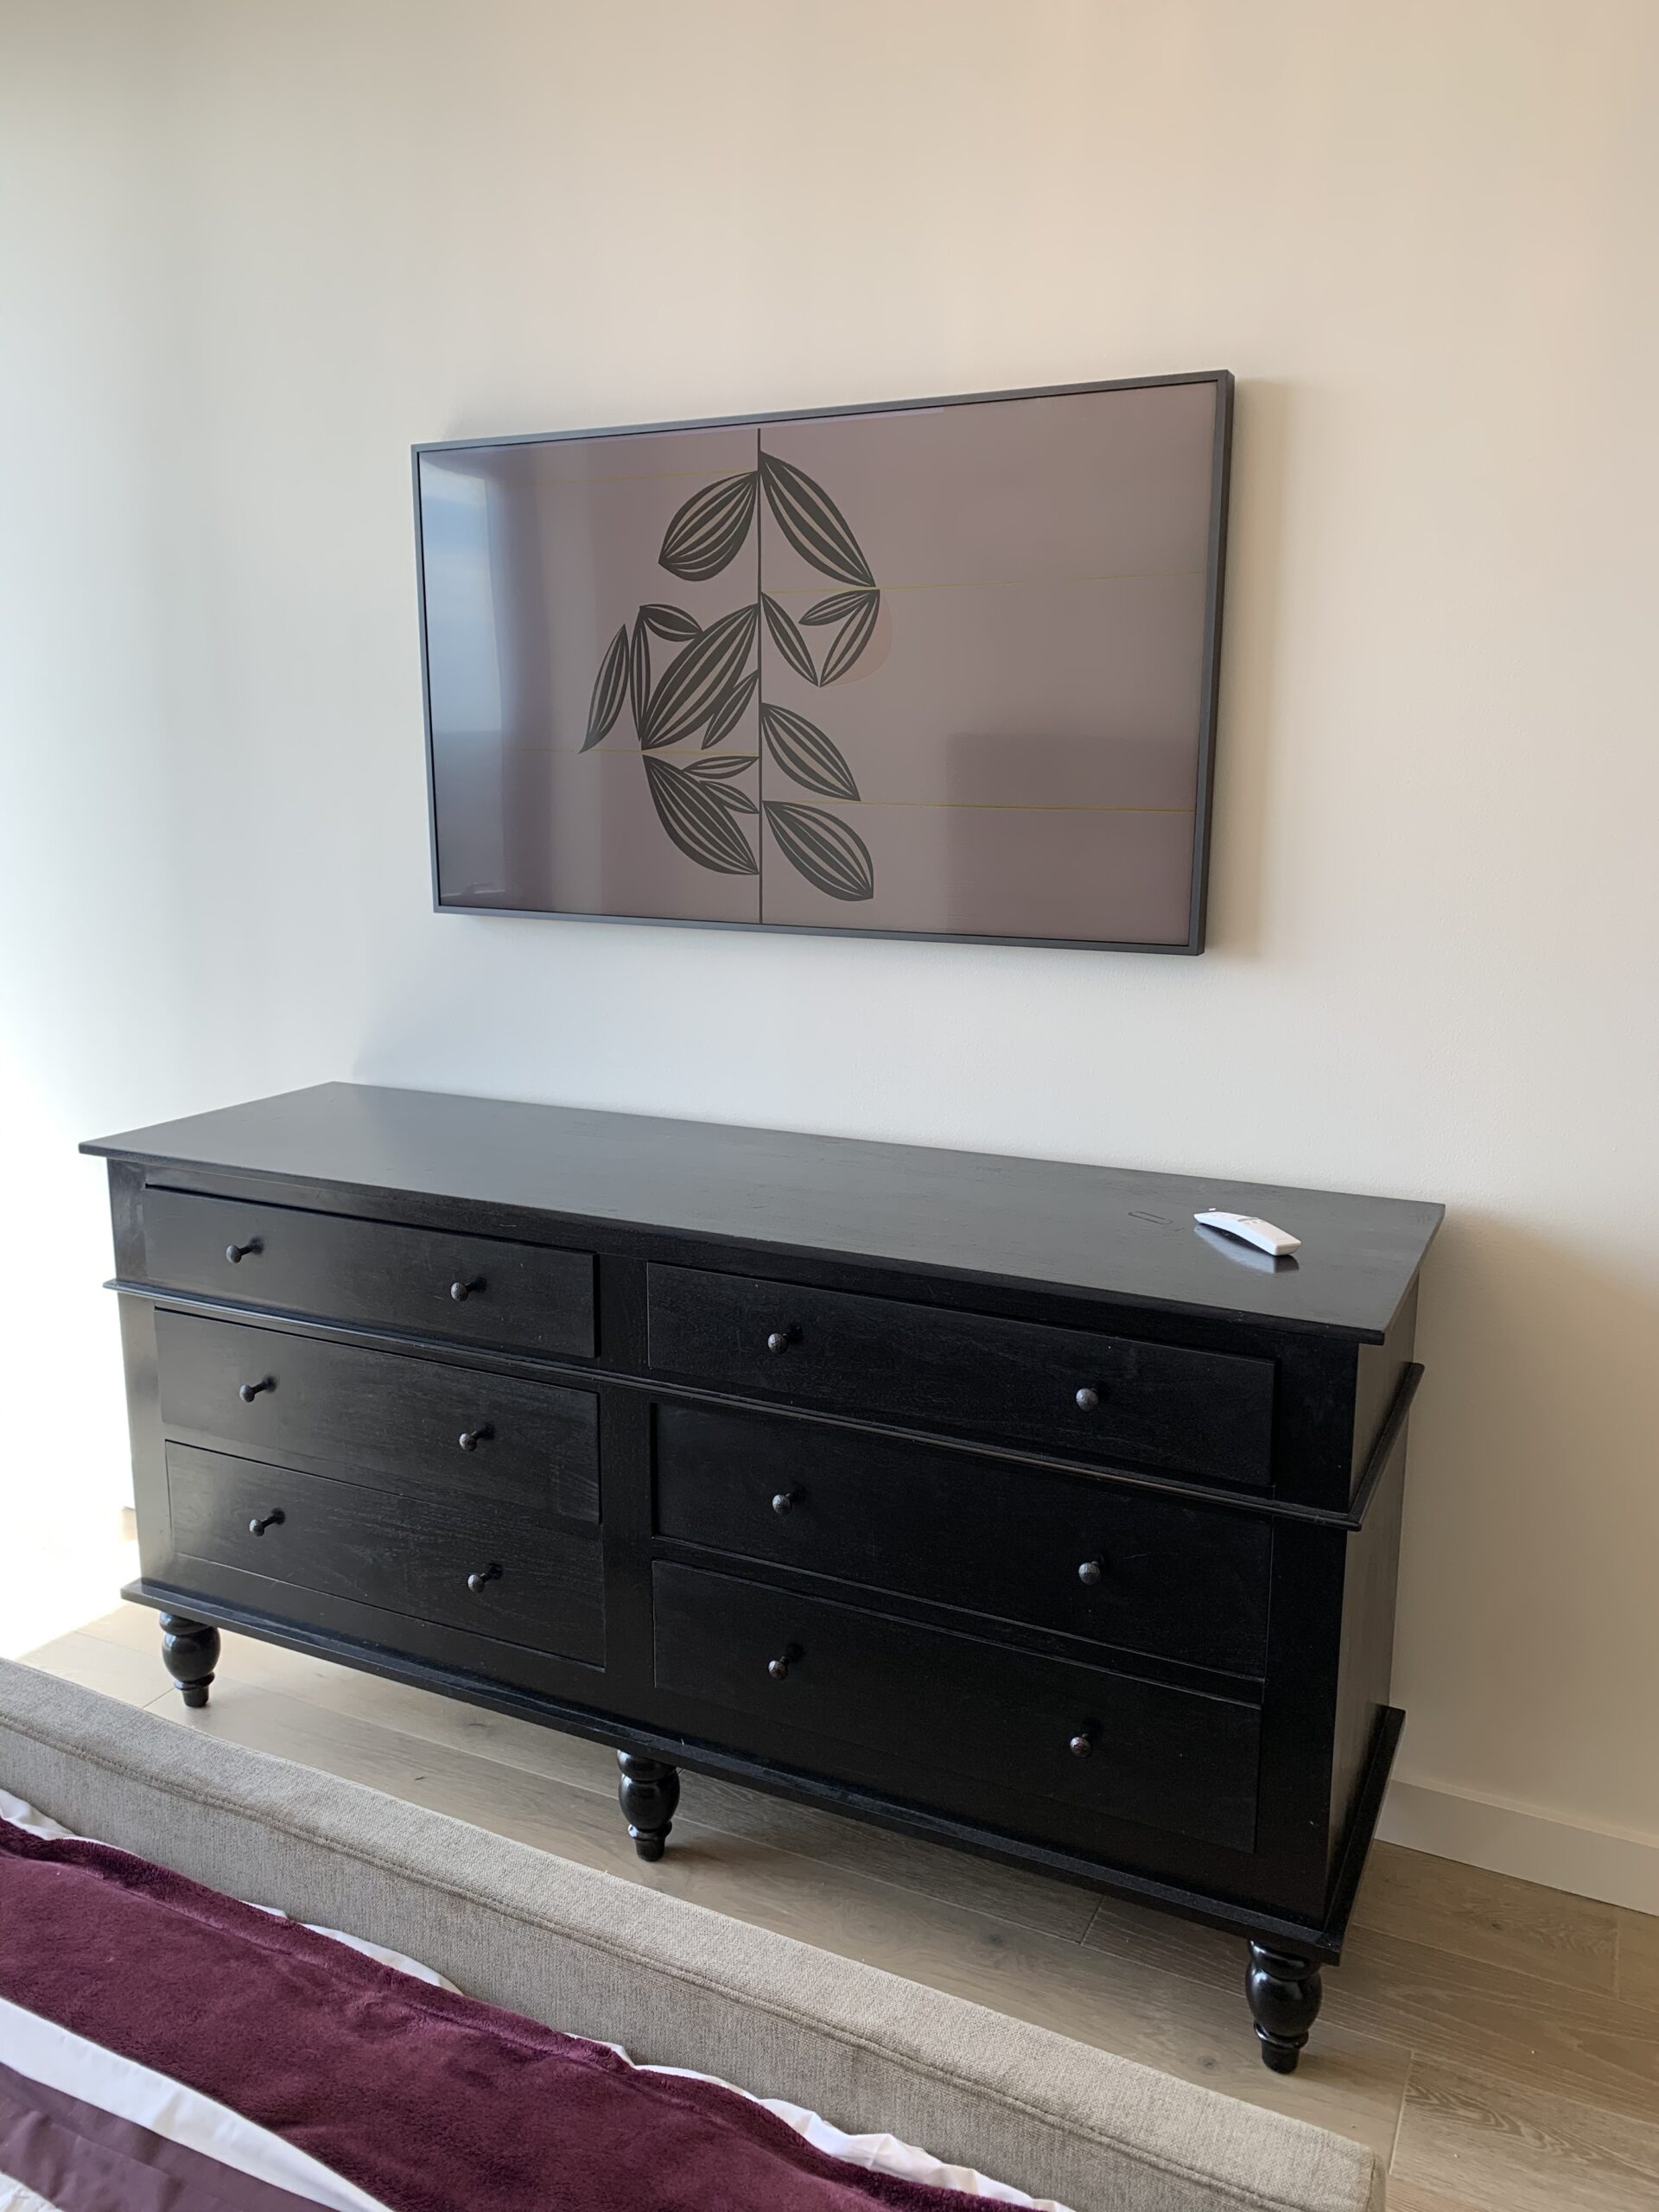 Samsung framed TV installed with art images in home media room